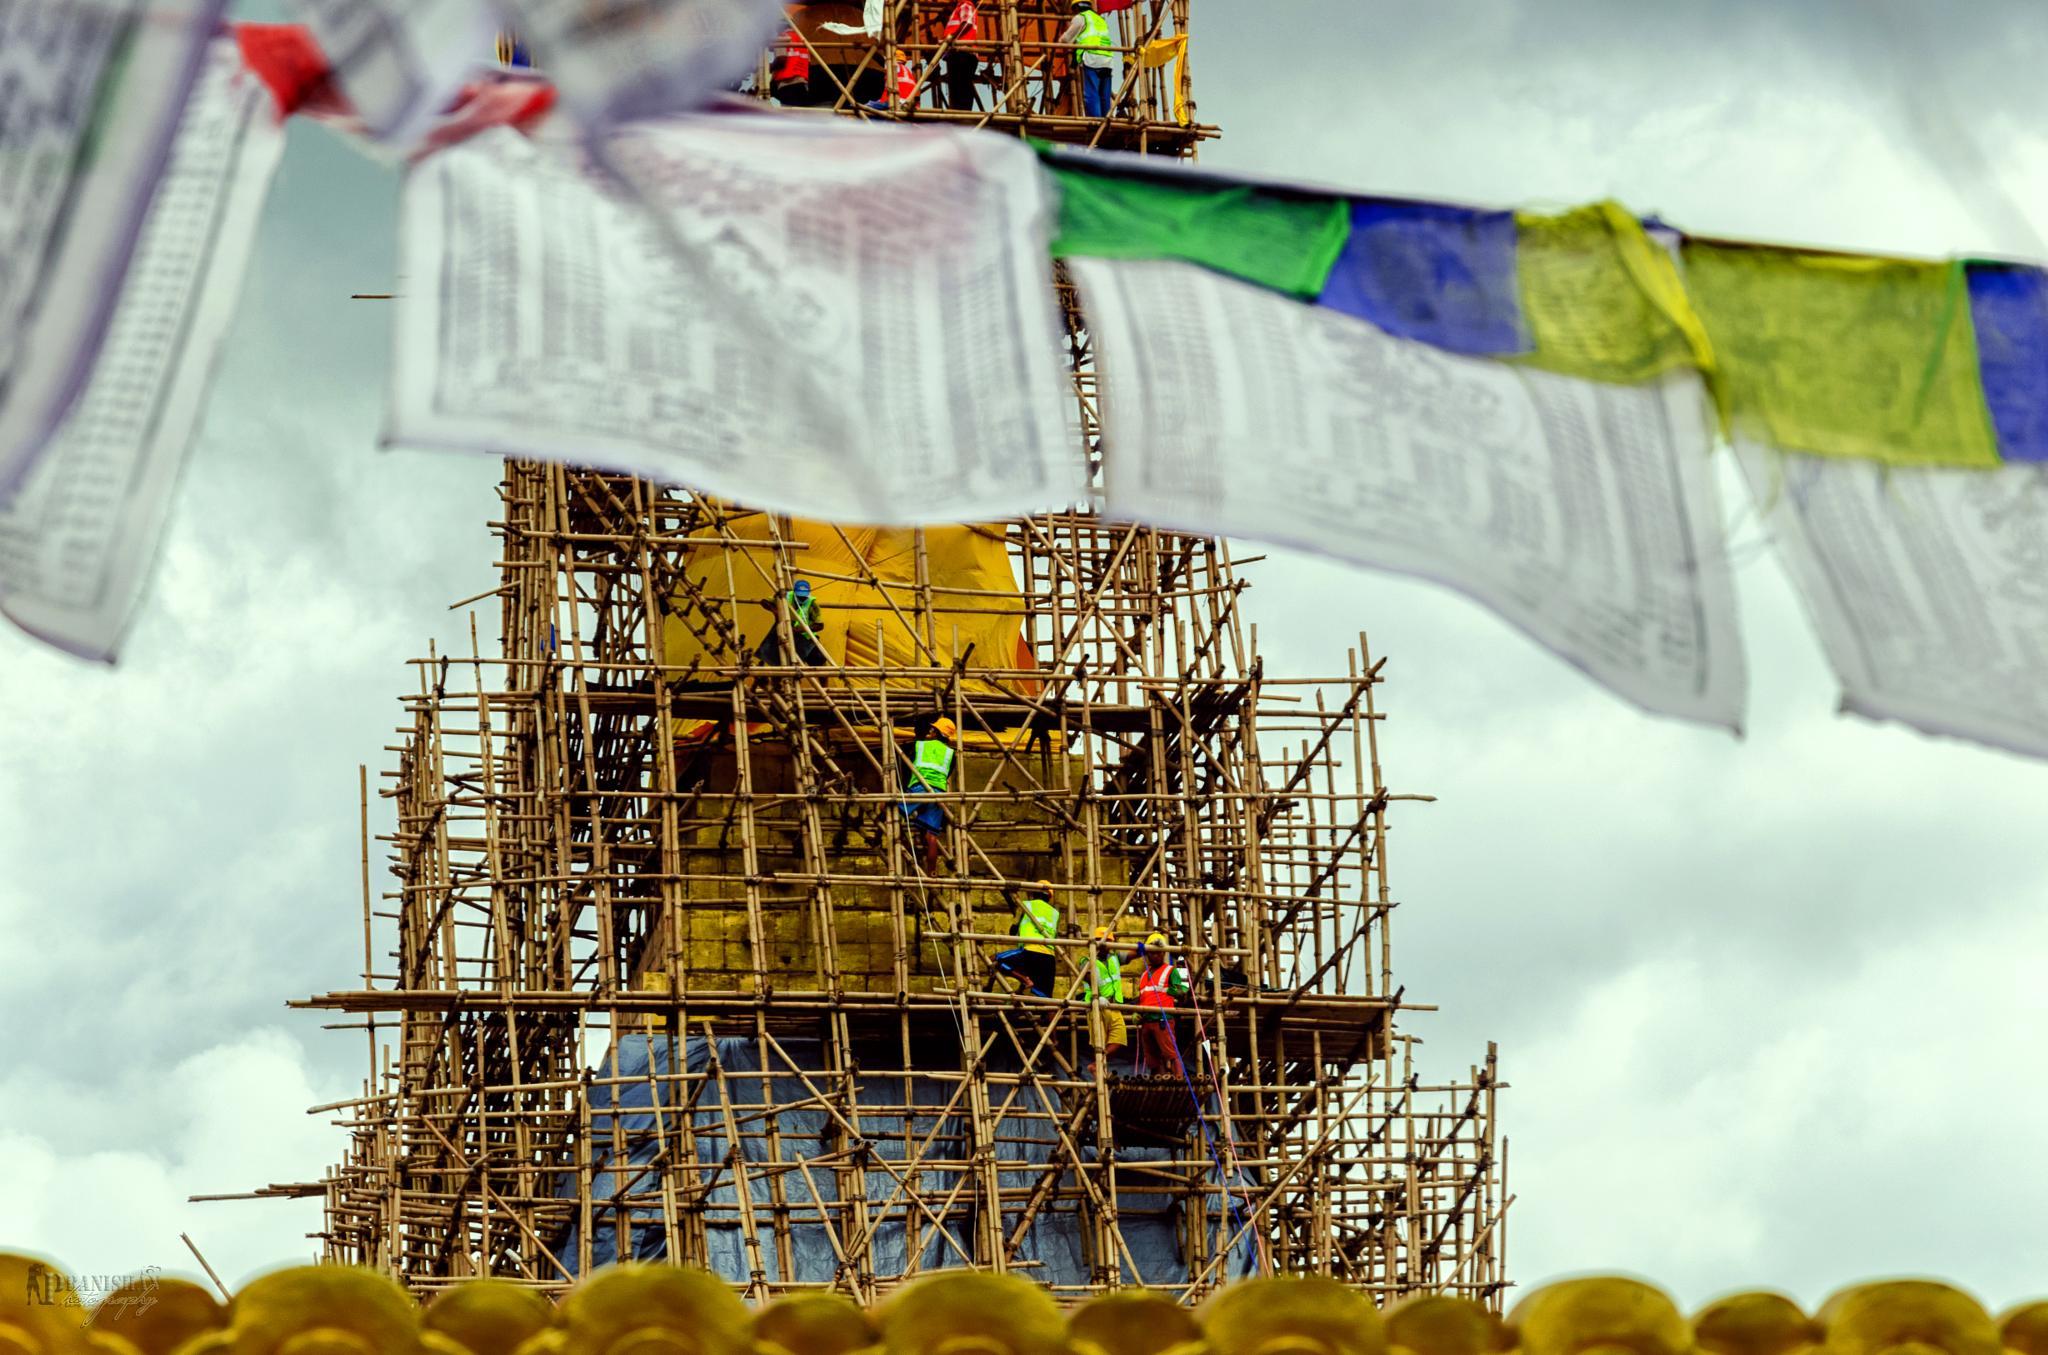 Workers  by Pranishan Rajbhandari